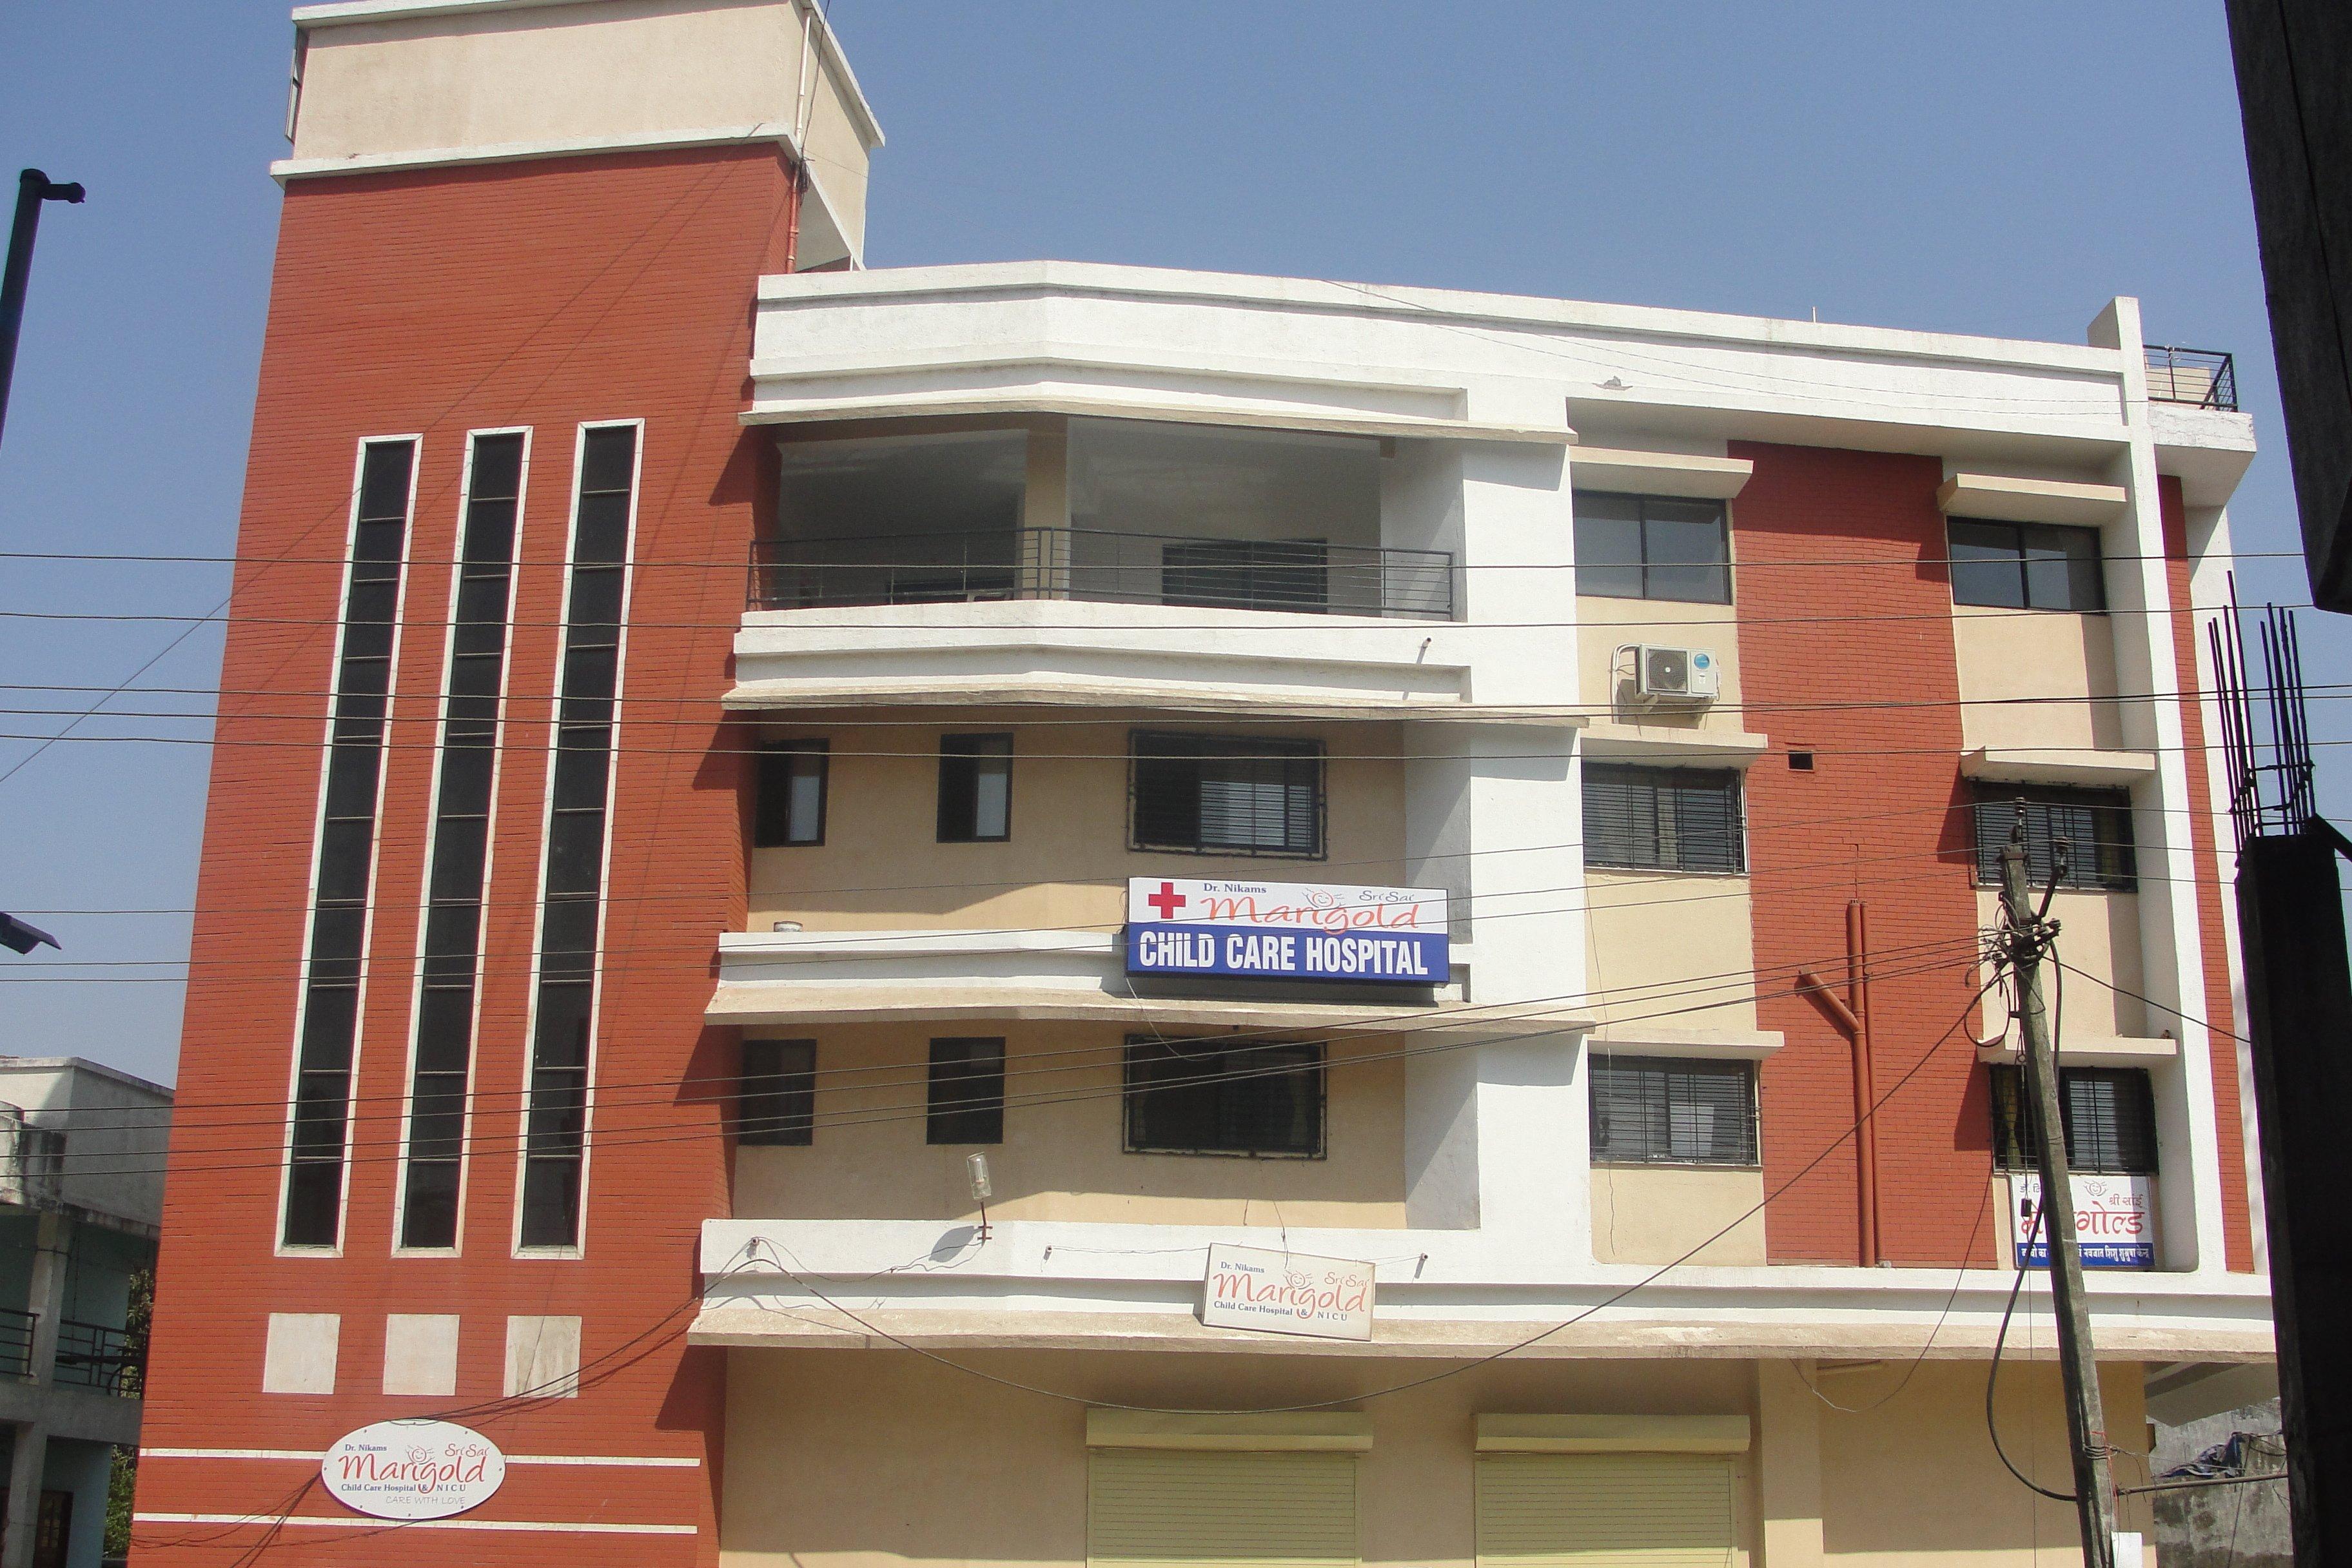 main building|Dr Nikam's Sri Sai Marigold Child Care Hospital and NICU|Amli,SILVASSA